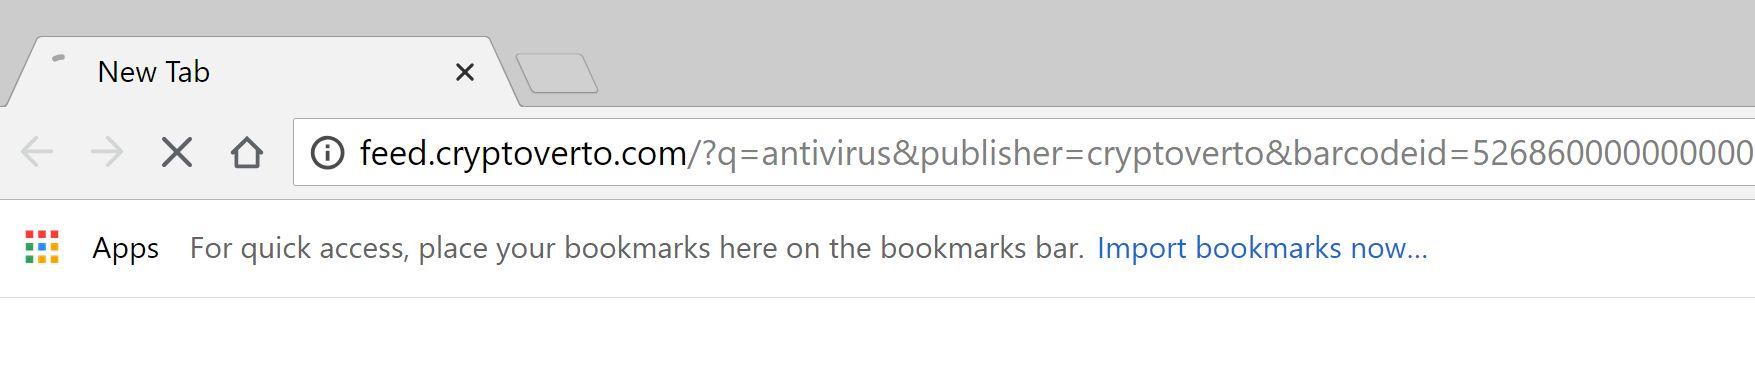 feed.cryptoverto.com redirect virus